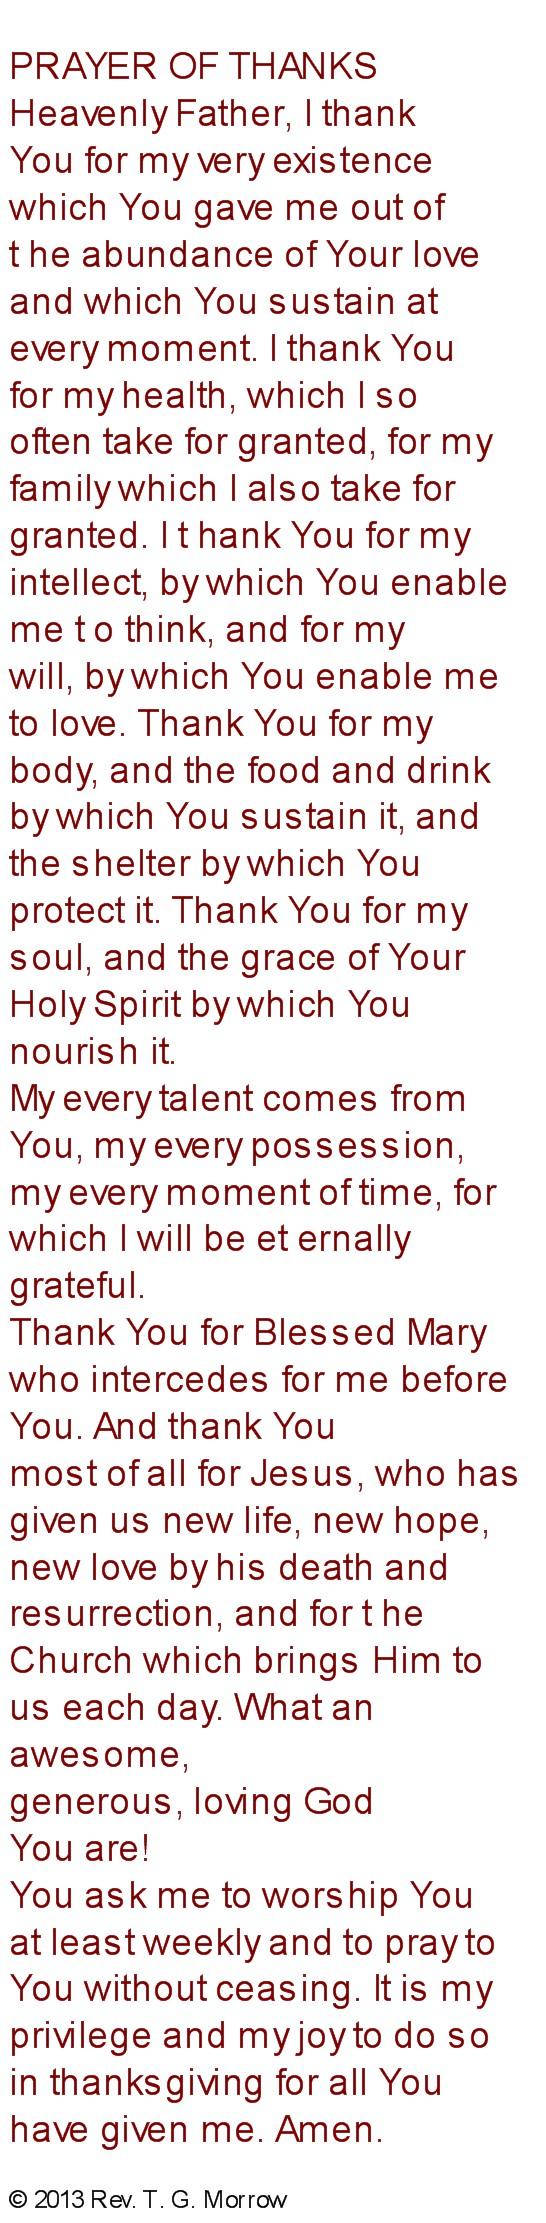 Prayer of Thanks Engl./Spanish